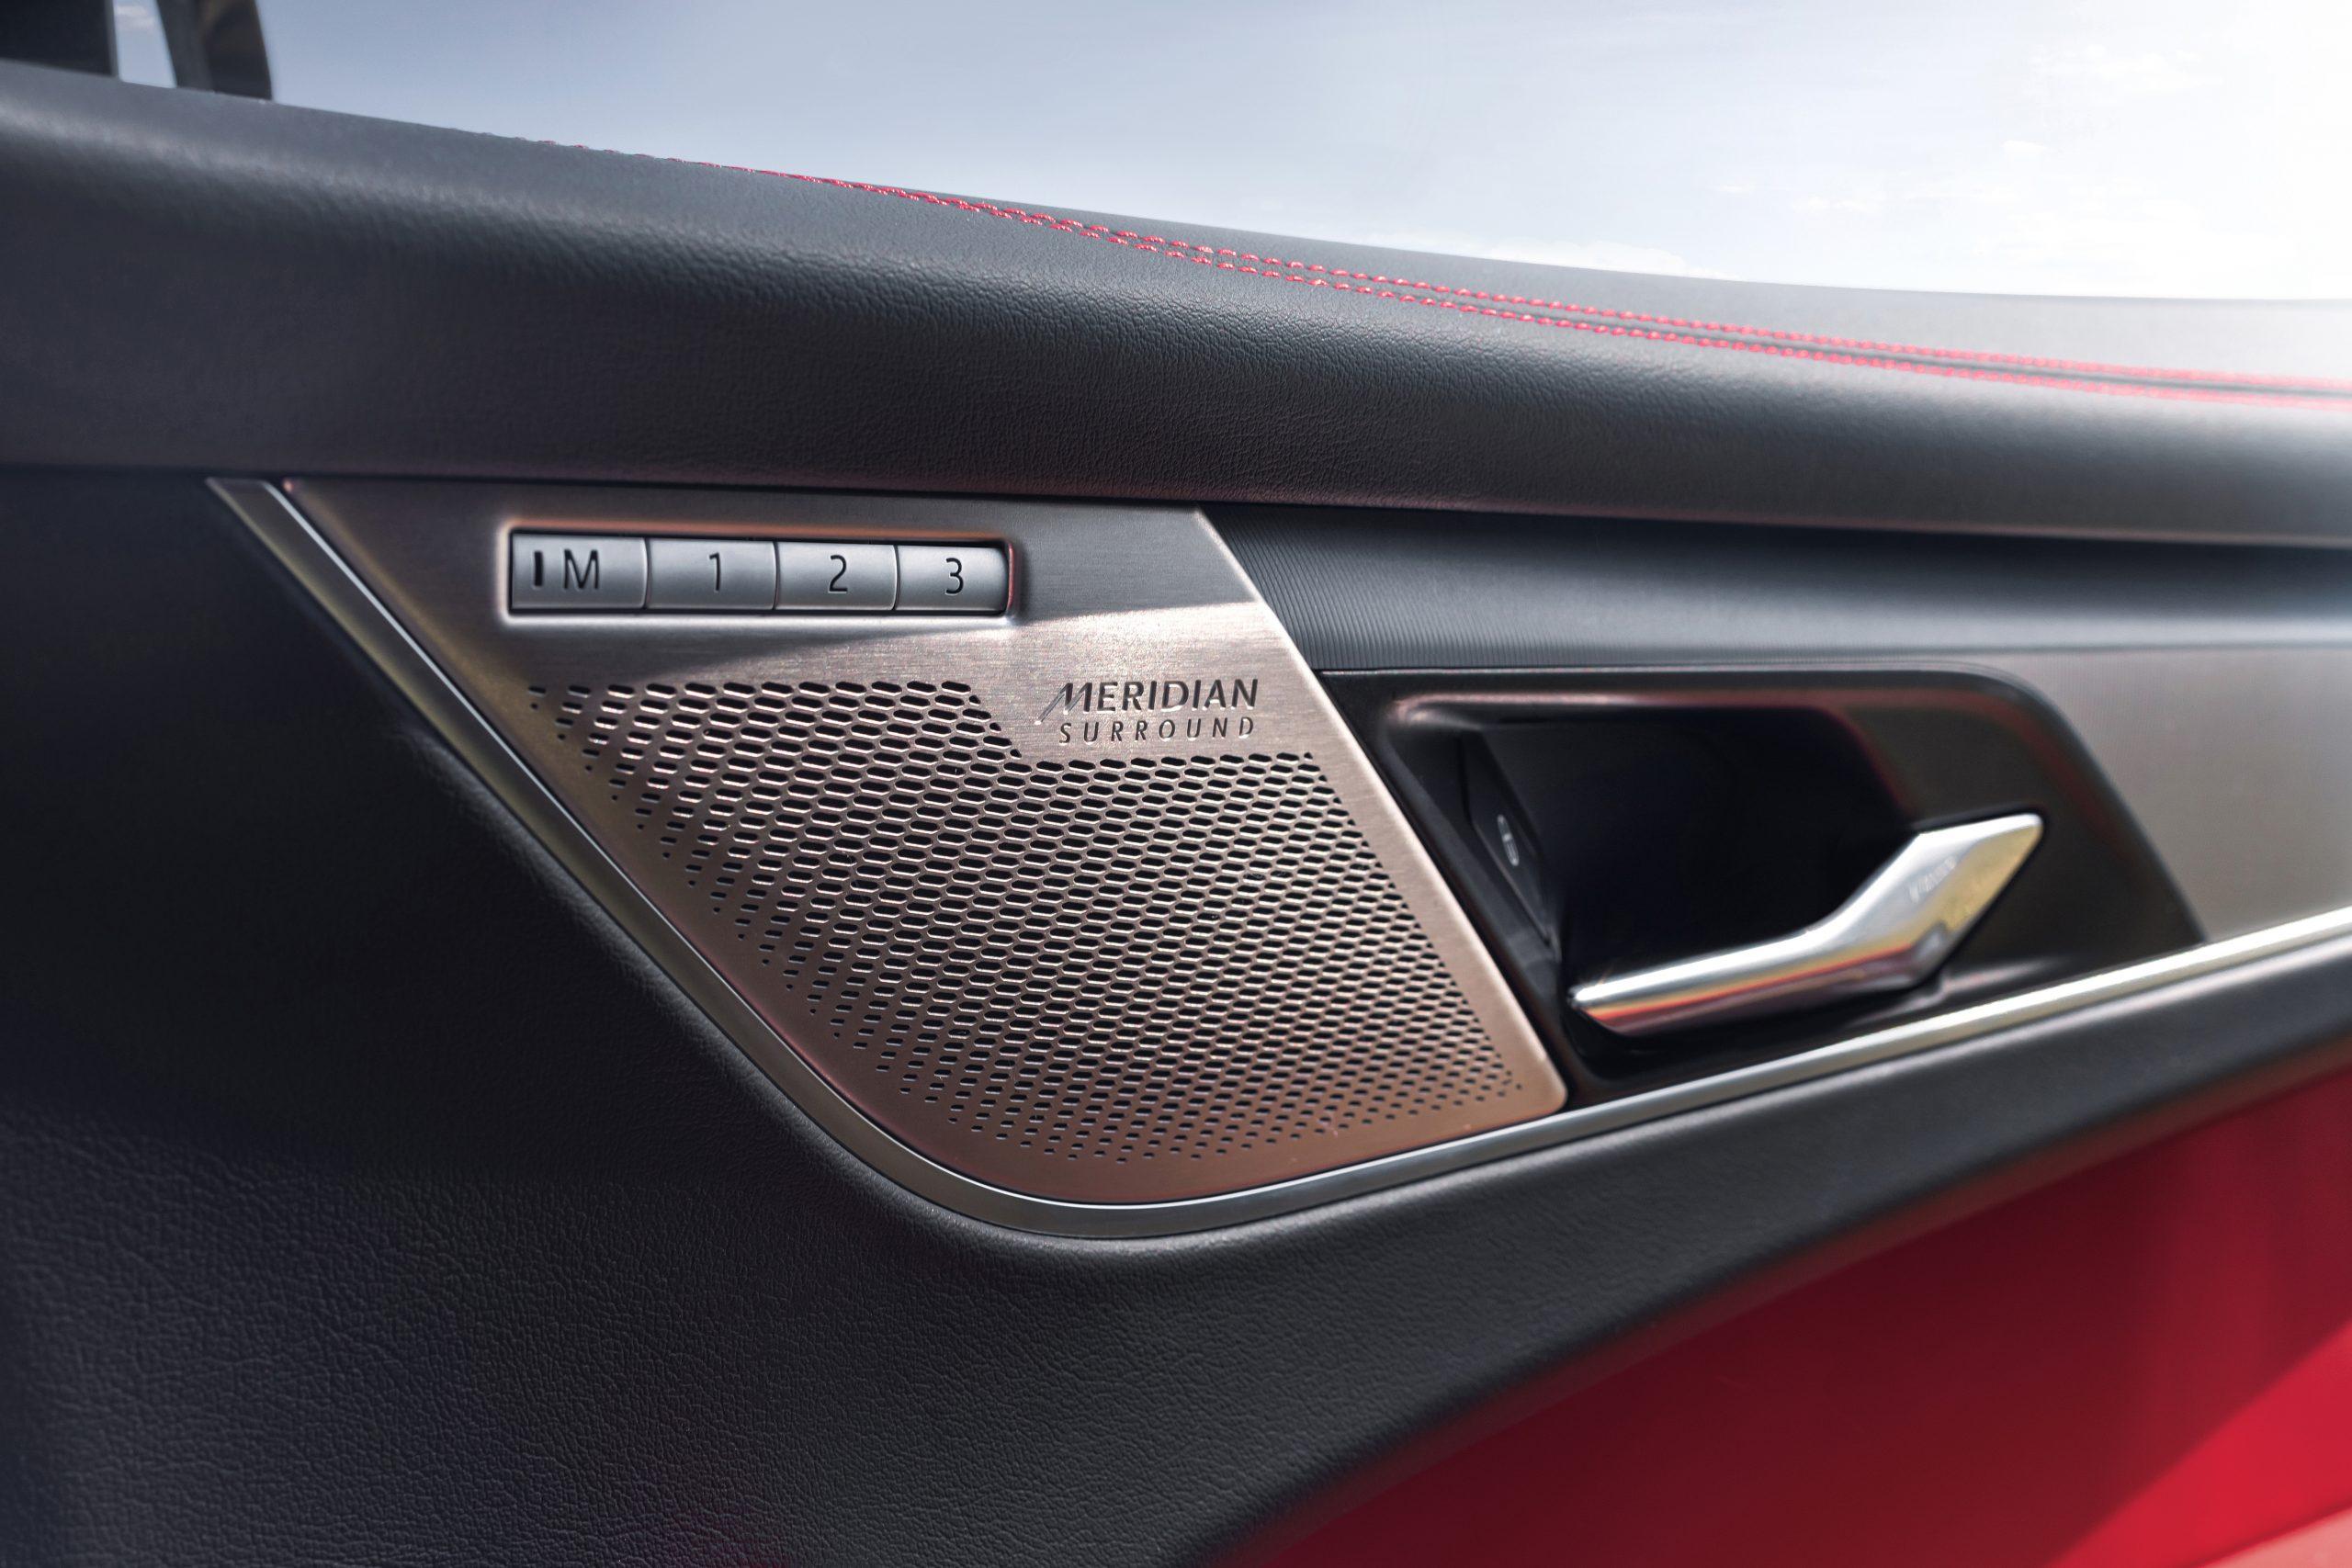 2021 Jaguar F-PACE interior detail speaker